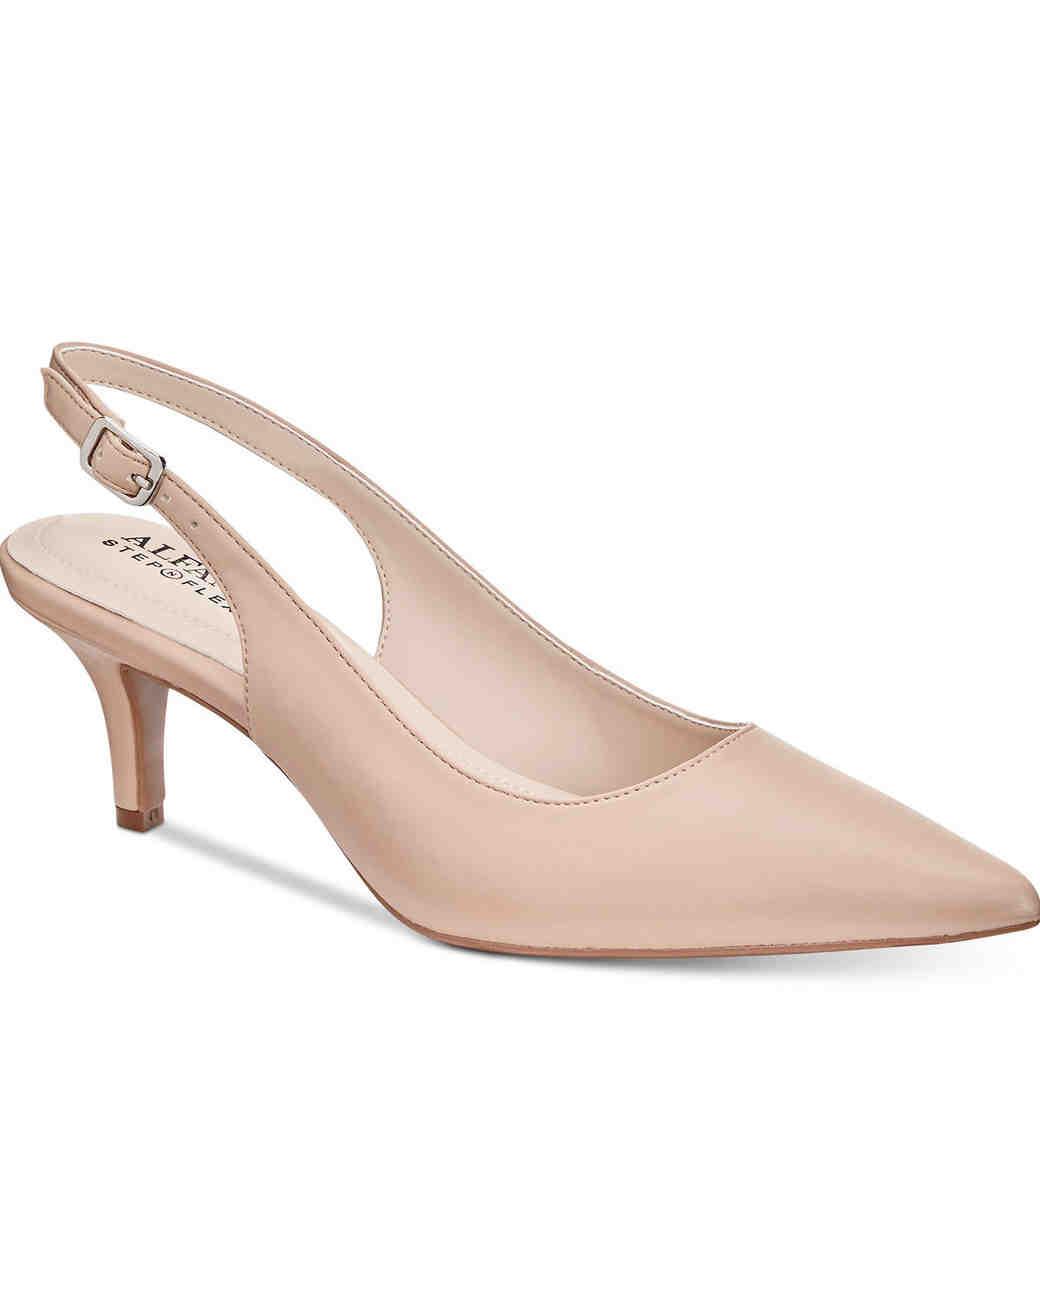 nude shoe crystal embellished suede mules